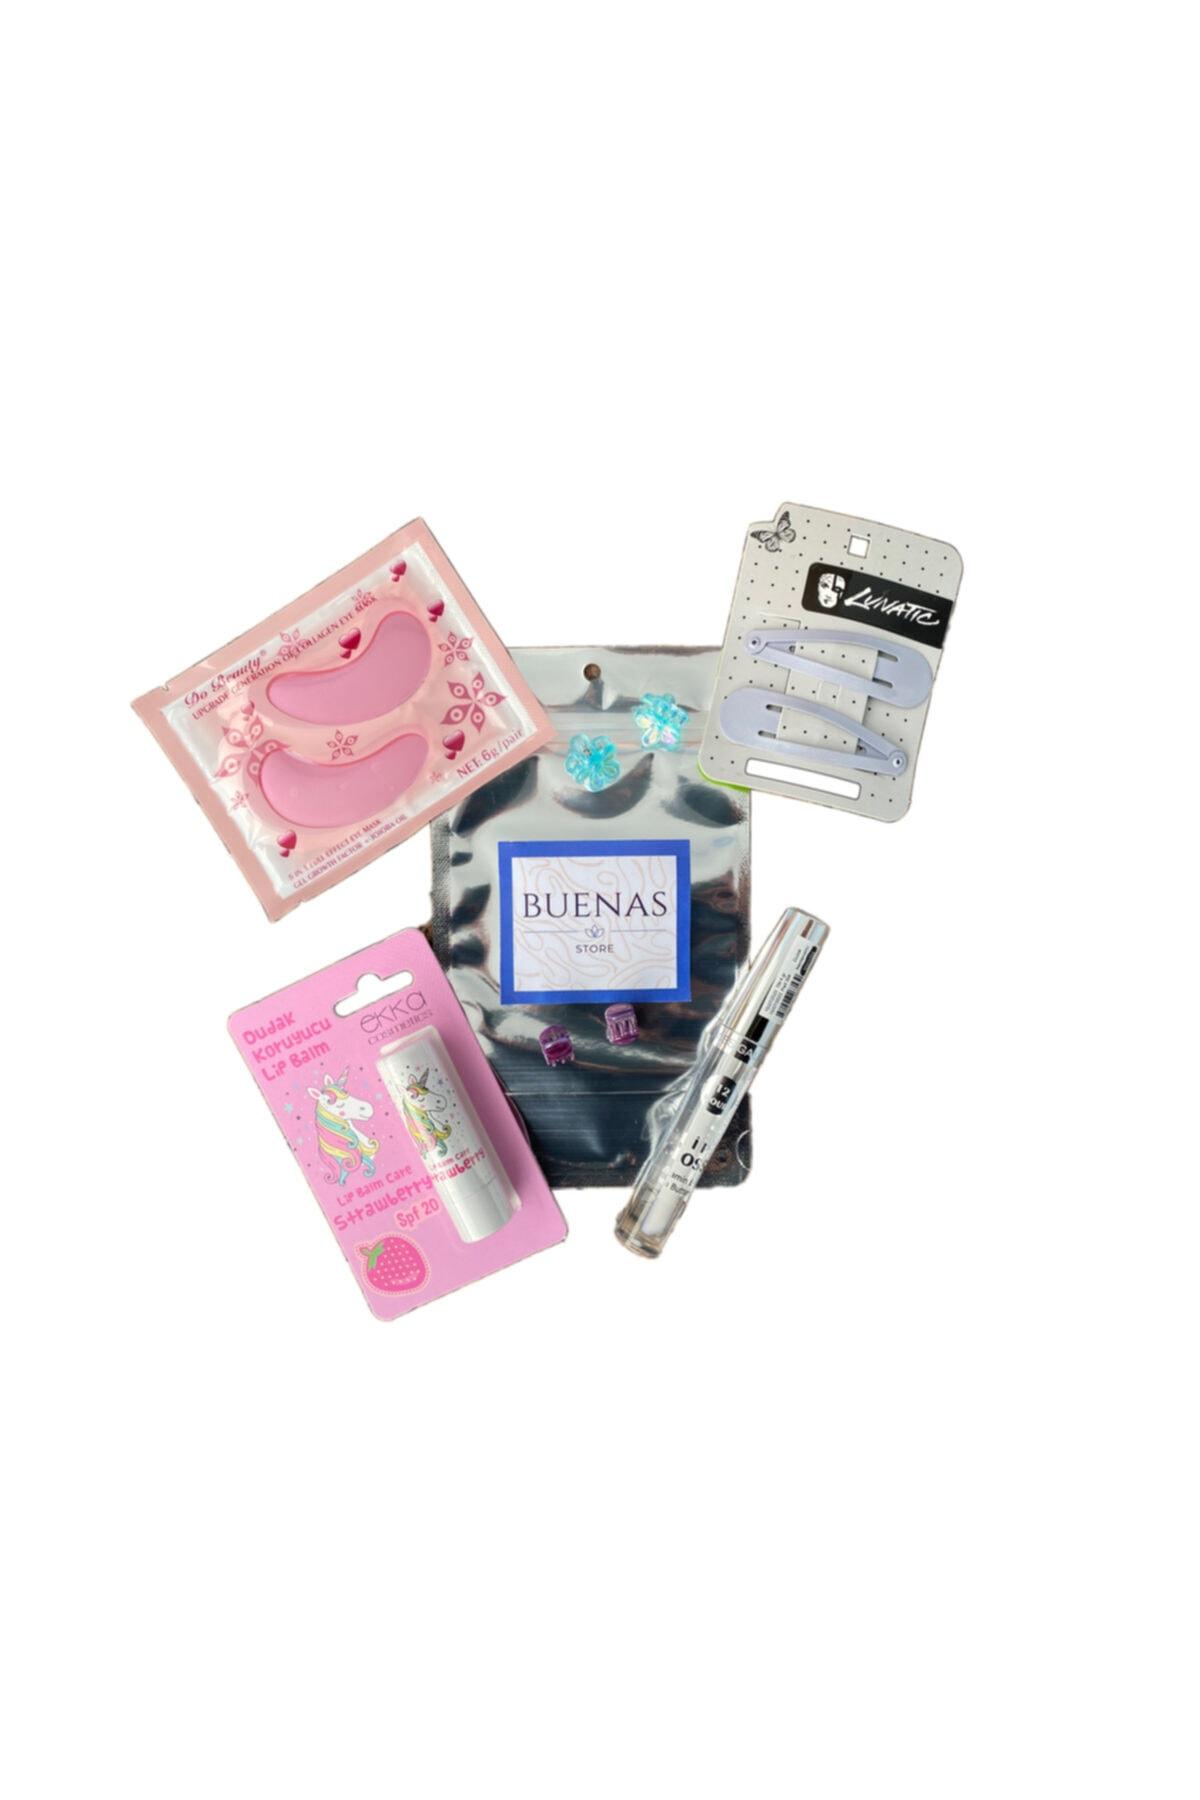 buenas store Dudak Bakım Seti - Lip Balm & Lip Gloss 1